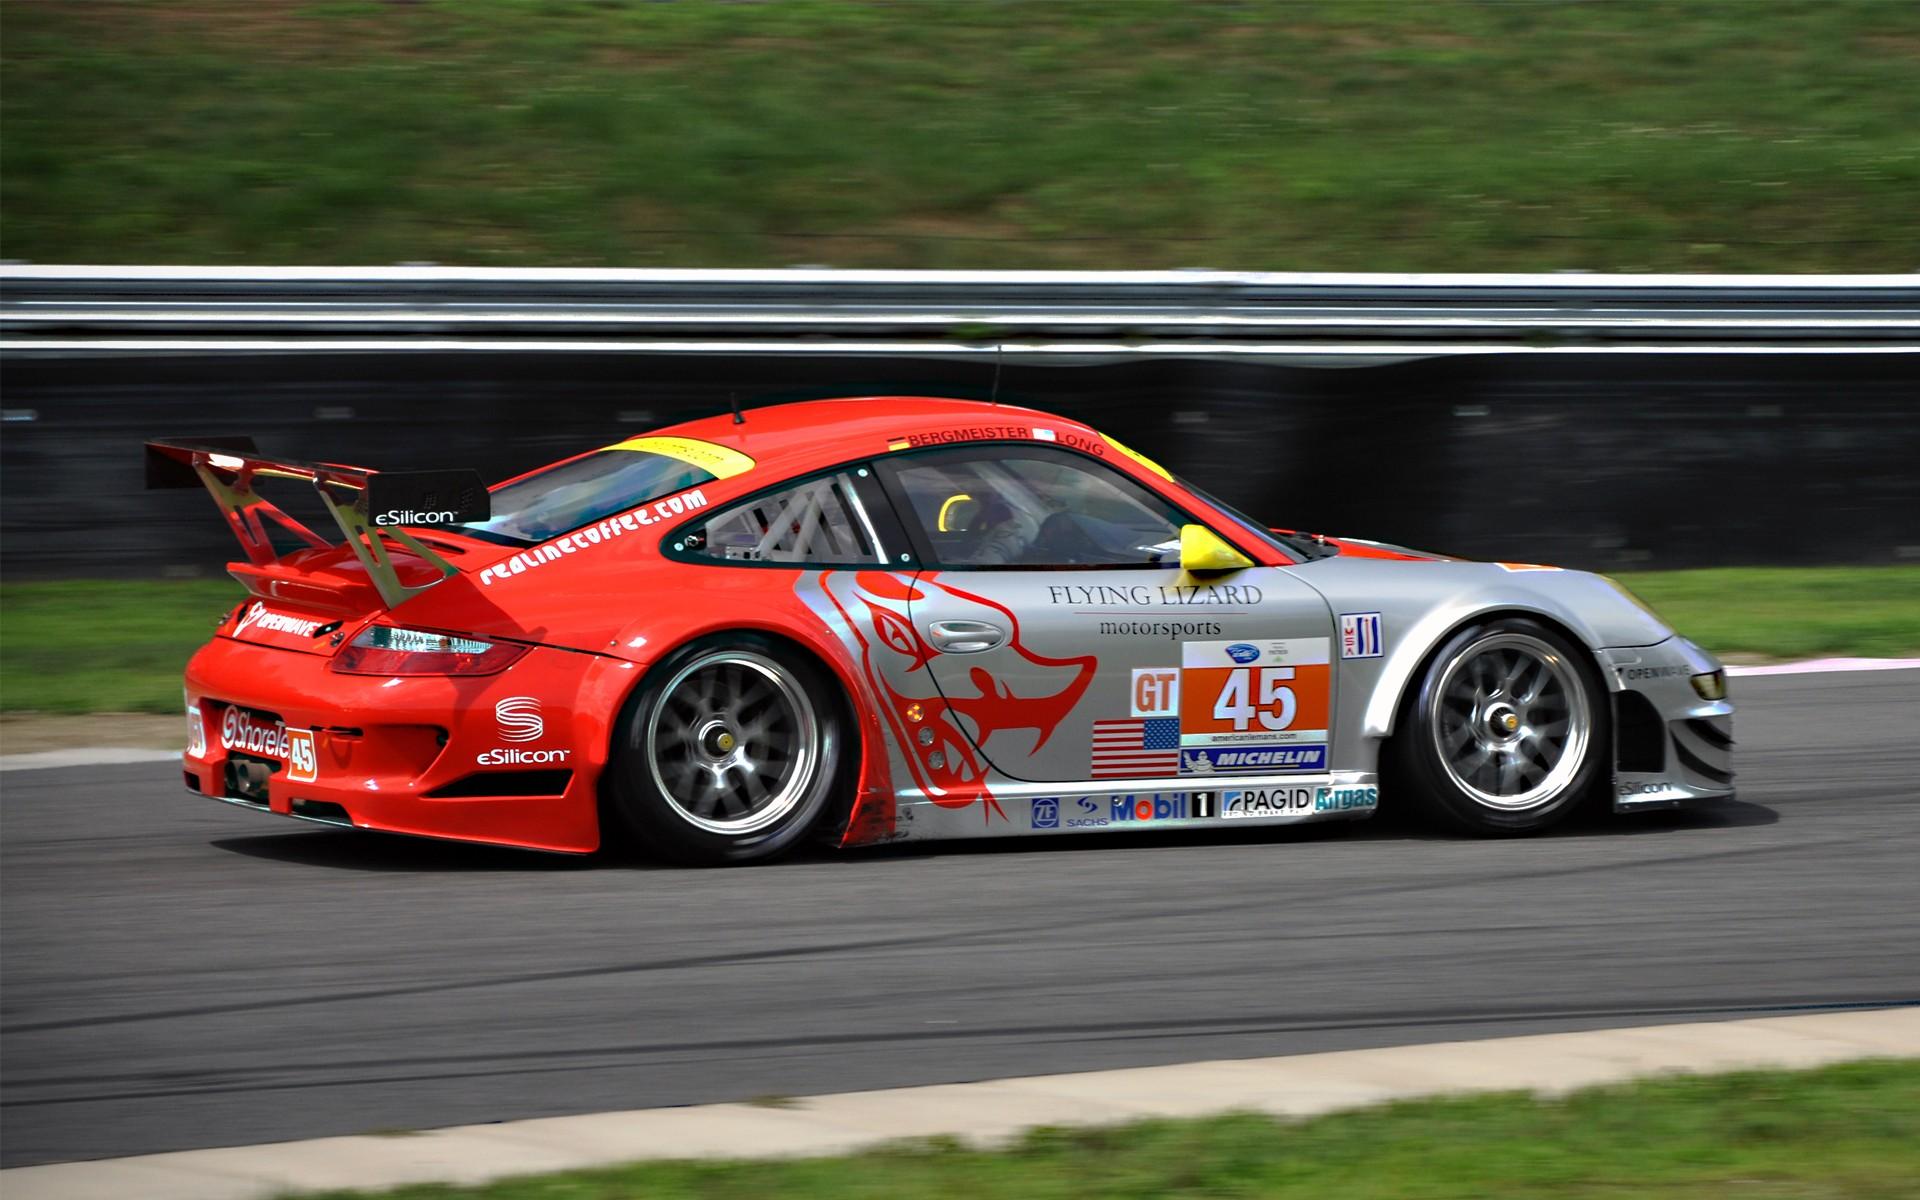 Porsche Racing Car   Wallpaper 38095 1920x1200